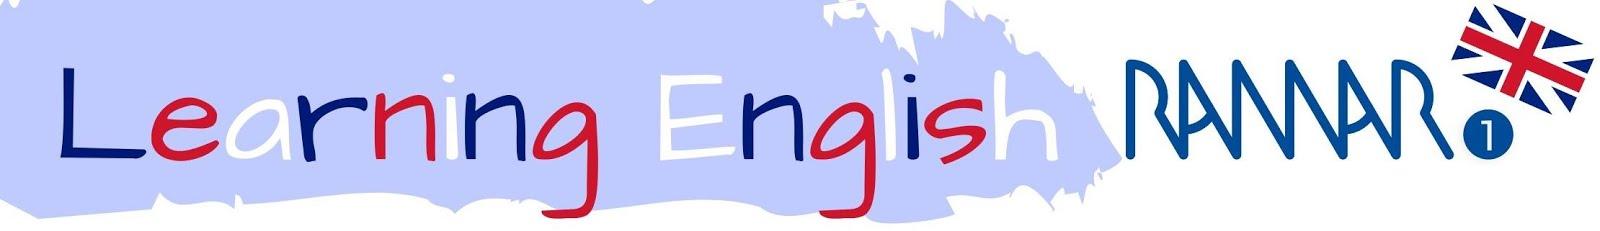 Learning English - C.E.Ramar